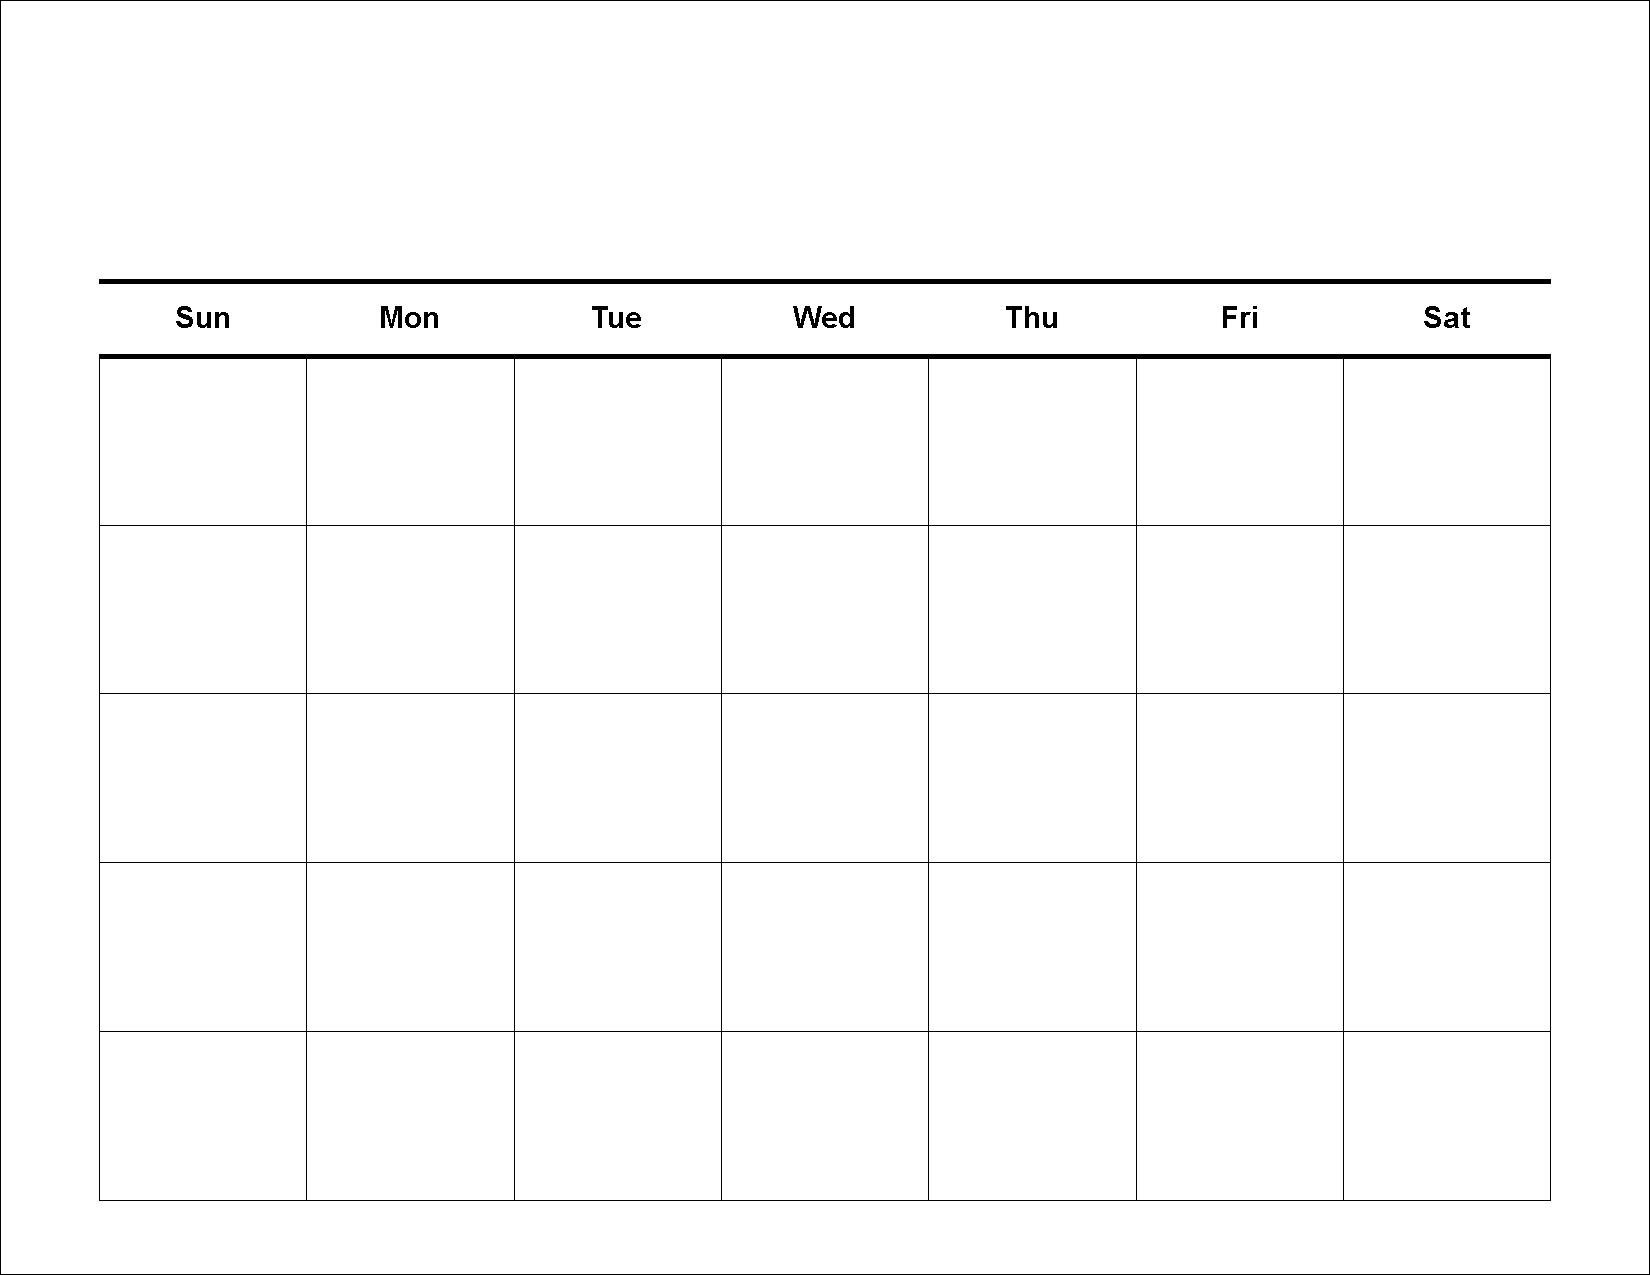 Free 5 Day Calendar Template | Printable Calendar Templates 2019 with 5 Day Blank Calendar Printable